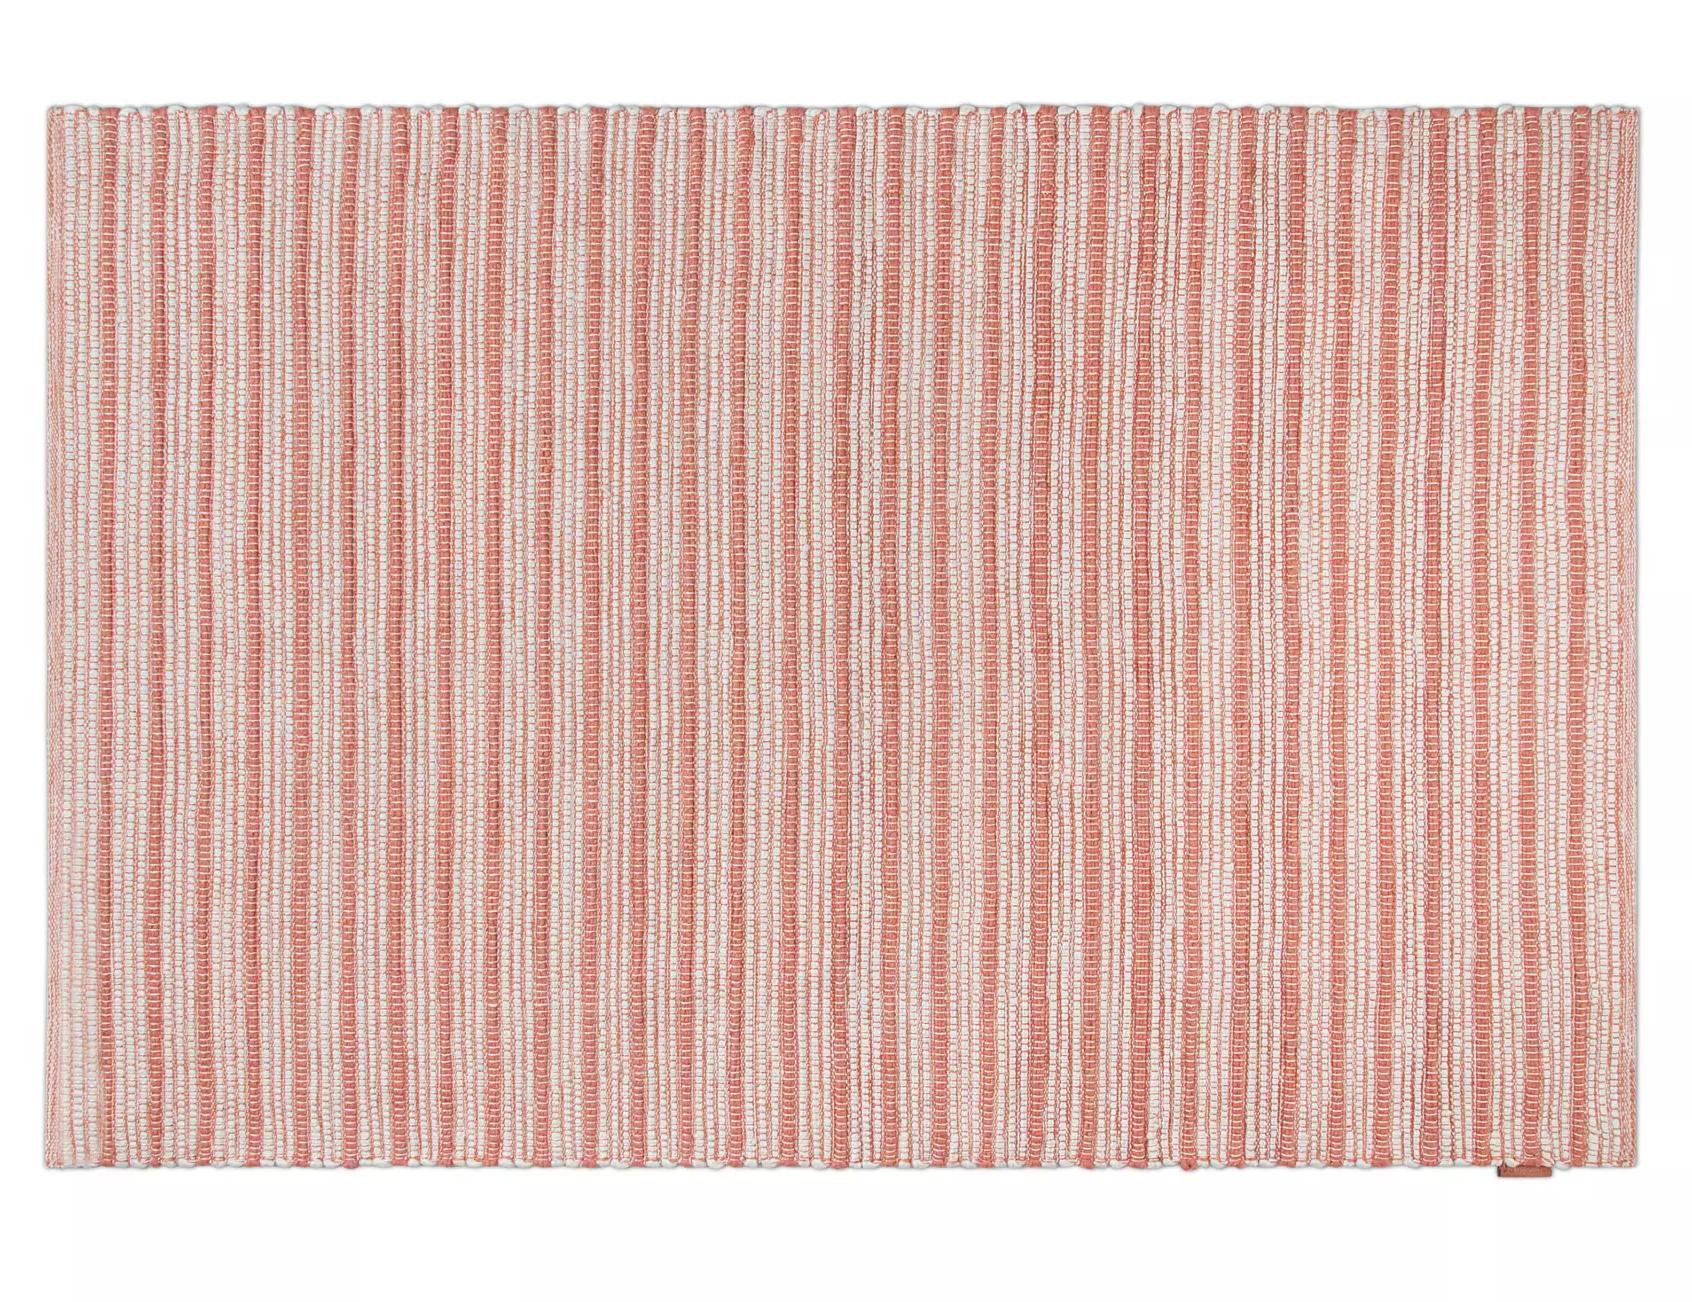 formgatan – stripe rug